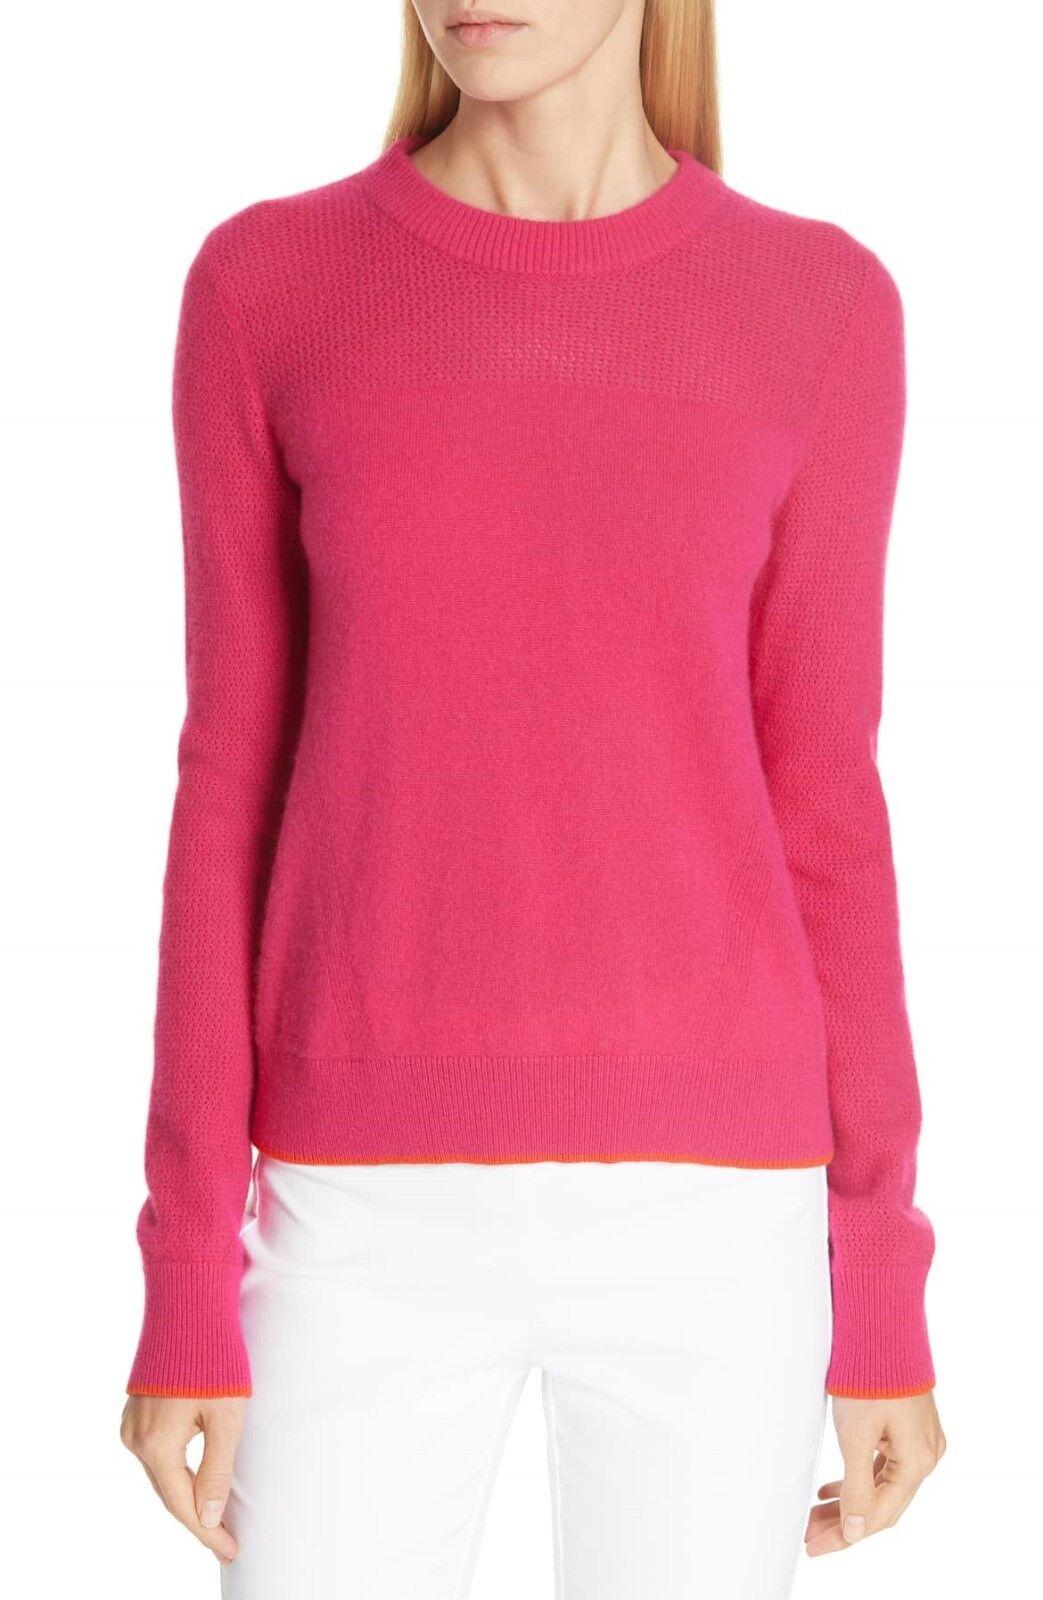 NEW Rag & Bone Yorke Cashmere Crewneck Sweater in Rosa - Größe S